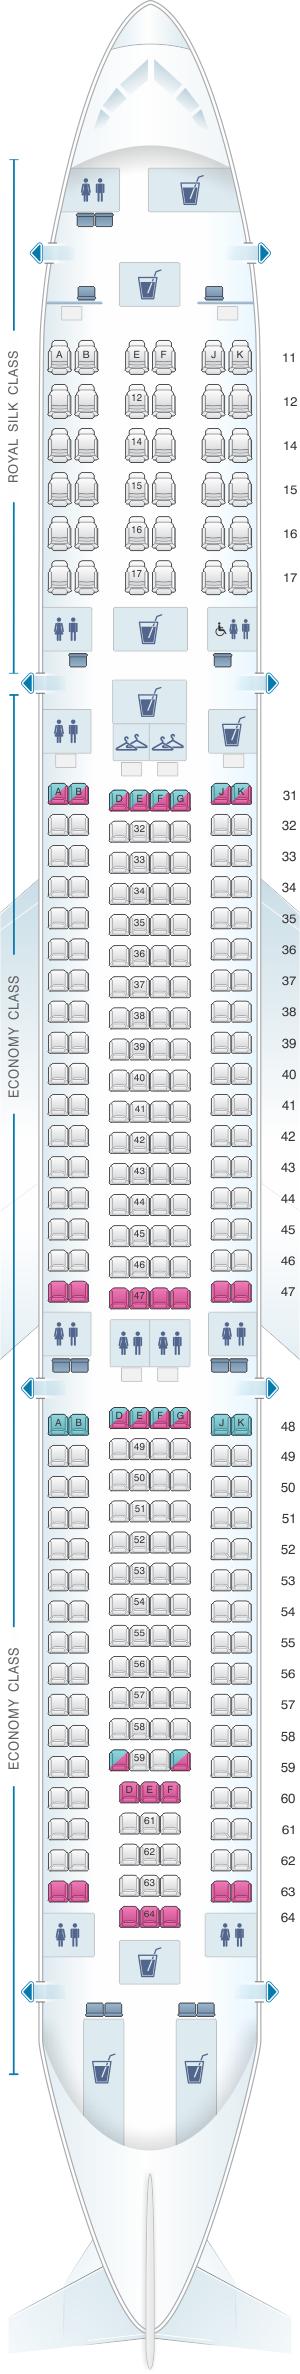 Seat map for Thai Airways International Airbus A330 300 (330/33H)